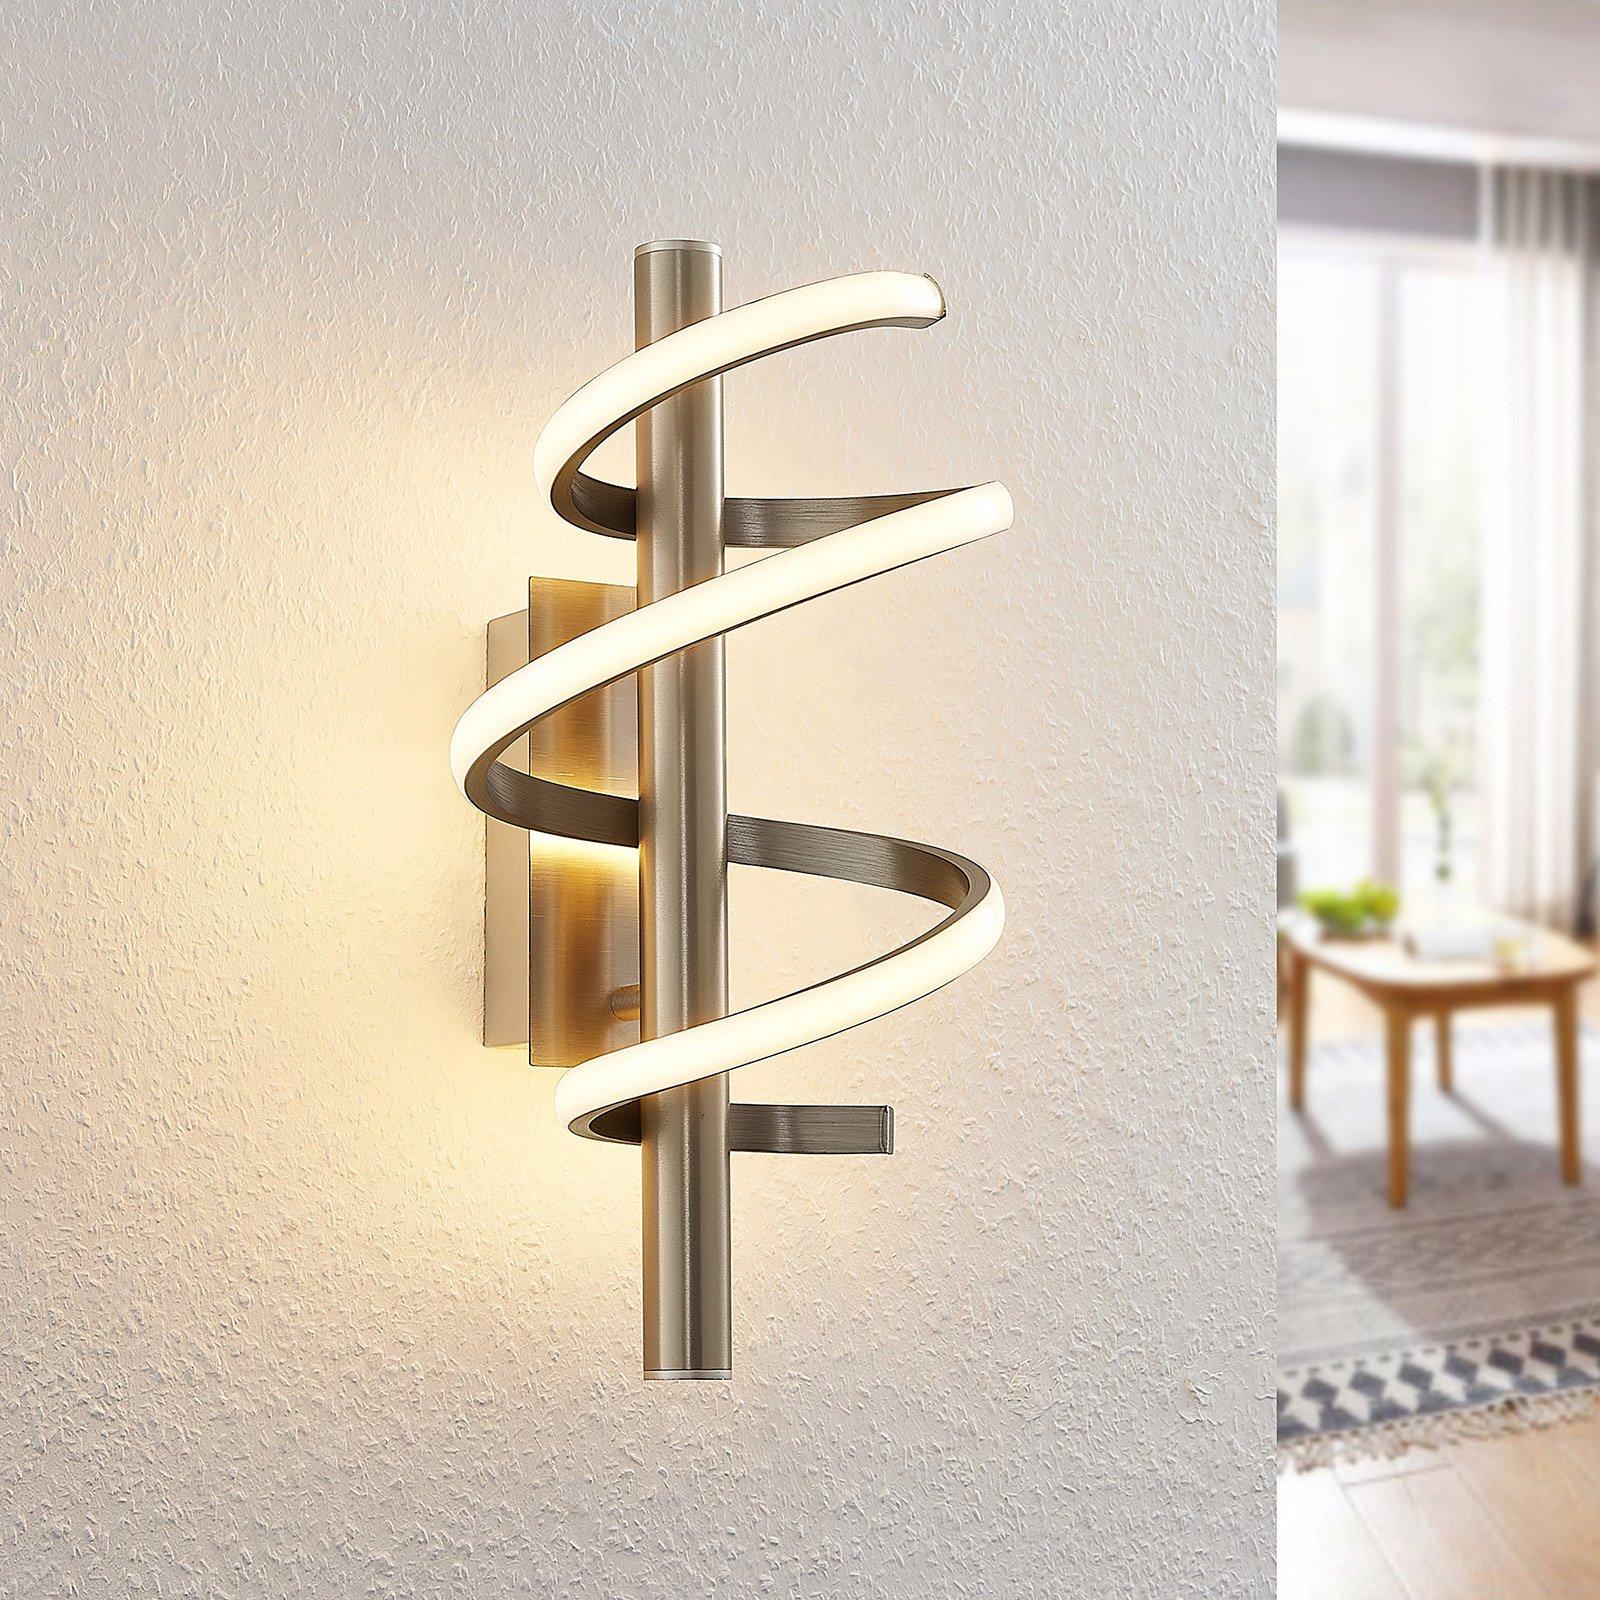 Lucande Milora LED-taklampe 27 cm, nikkel